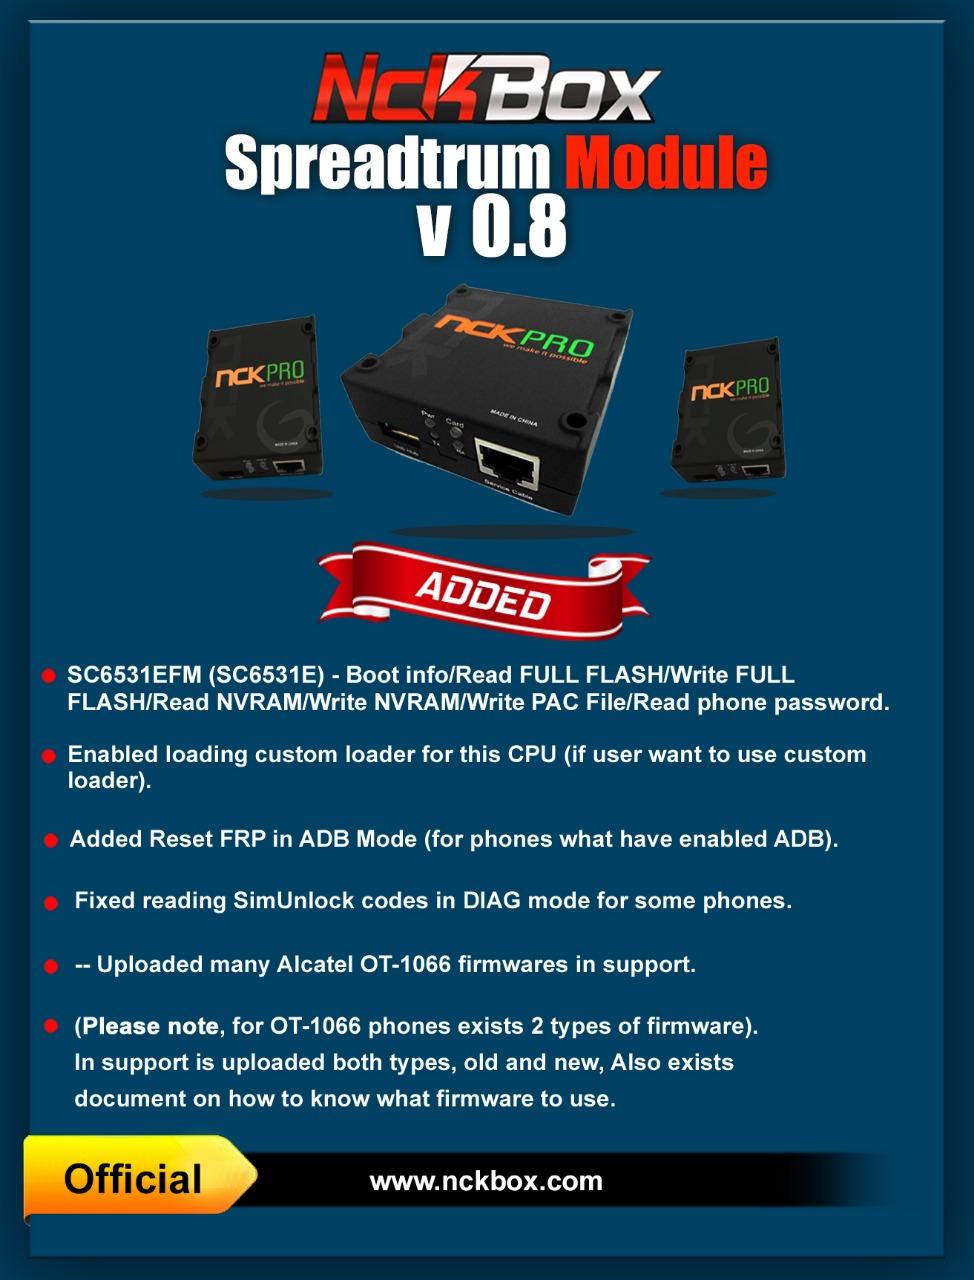 NCK Box /PRO Spreadtrum Module v1 0 Update Released